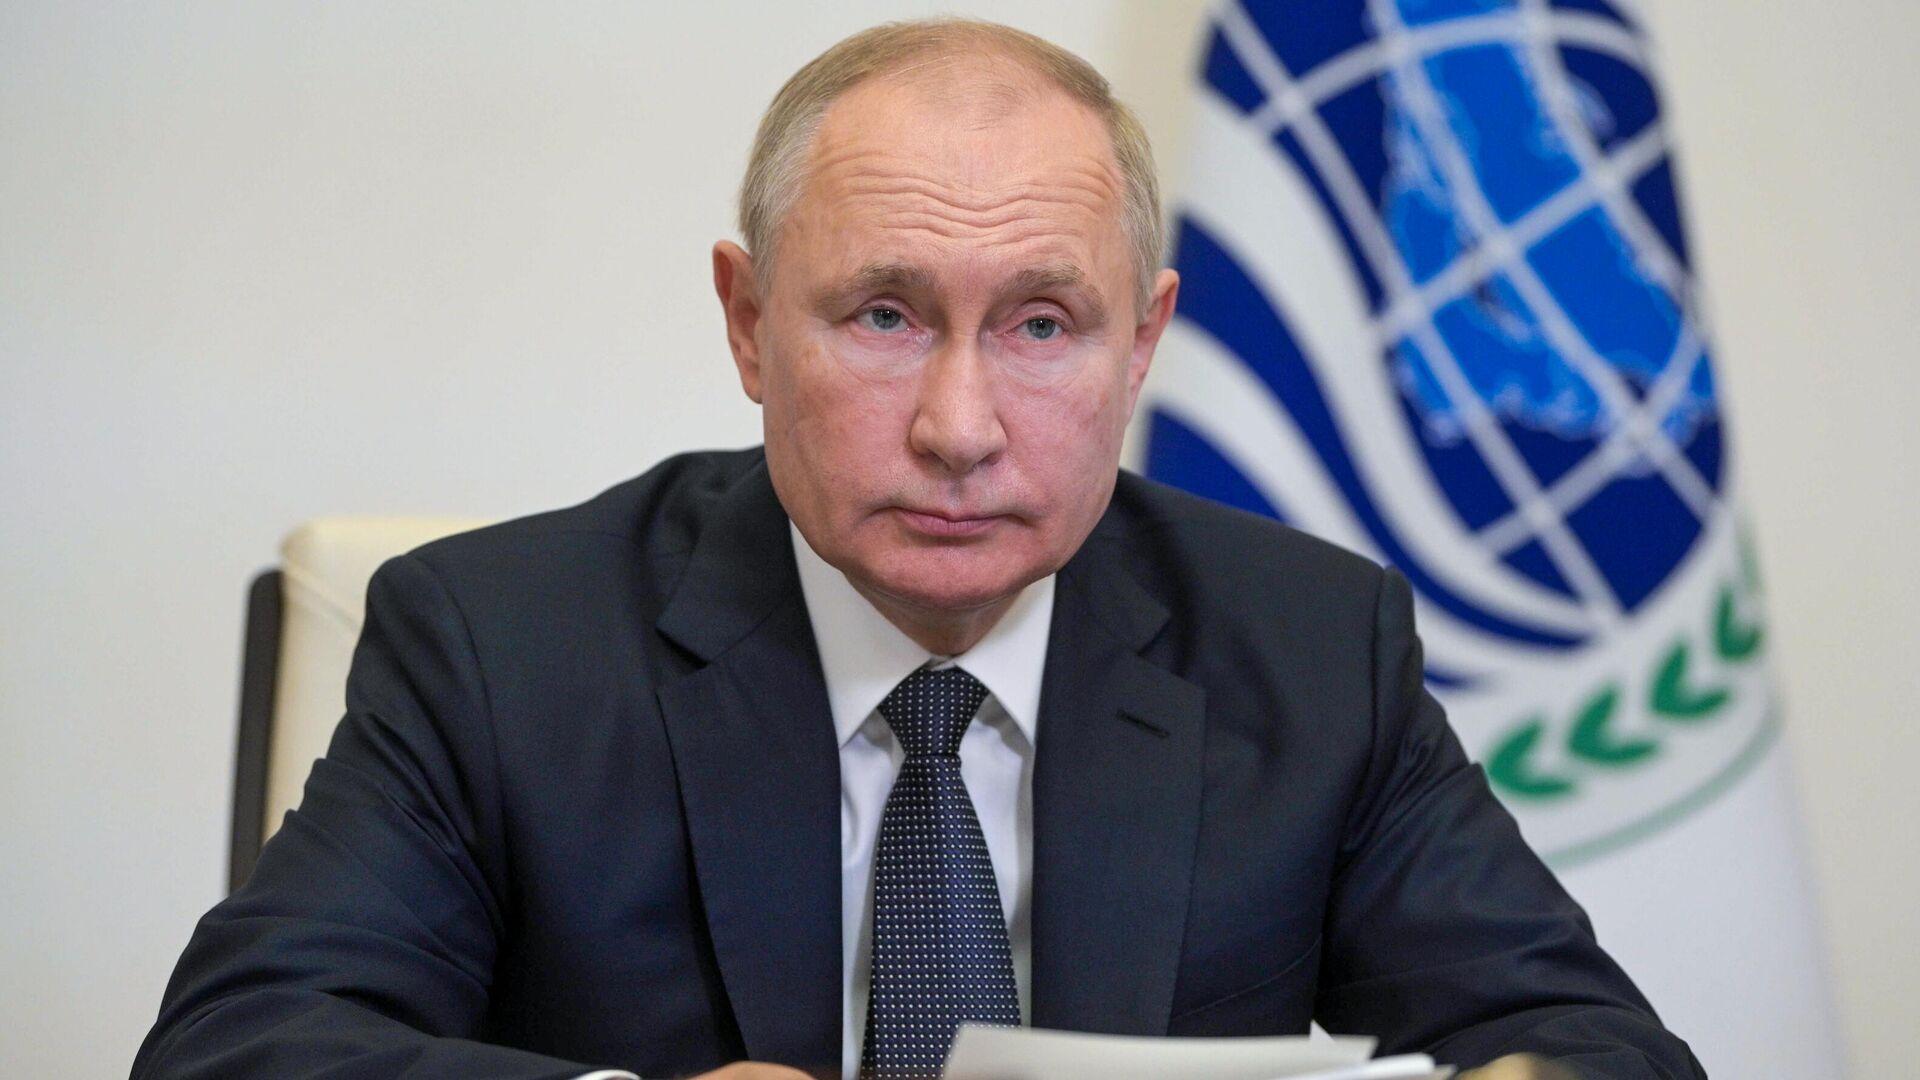 Президент РФ Владимир Путин - Sputnik Беларусь, 1920, 17.09.2021